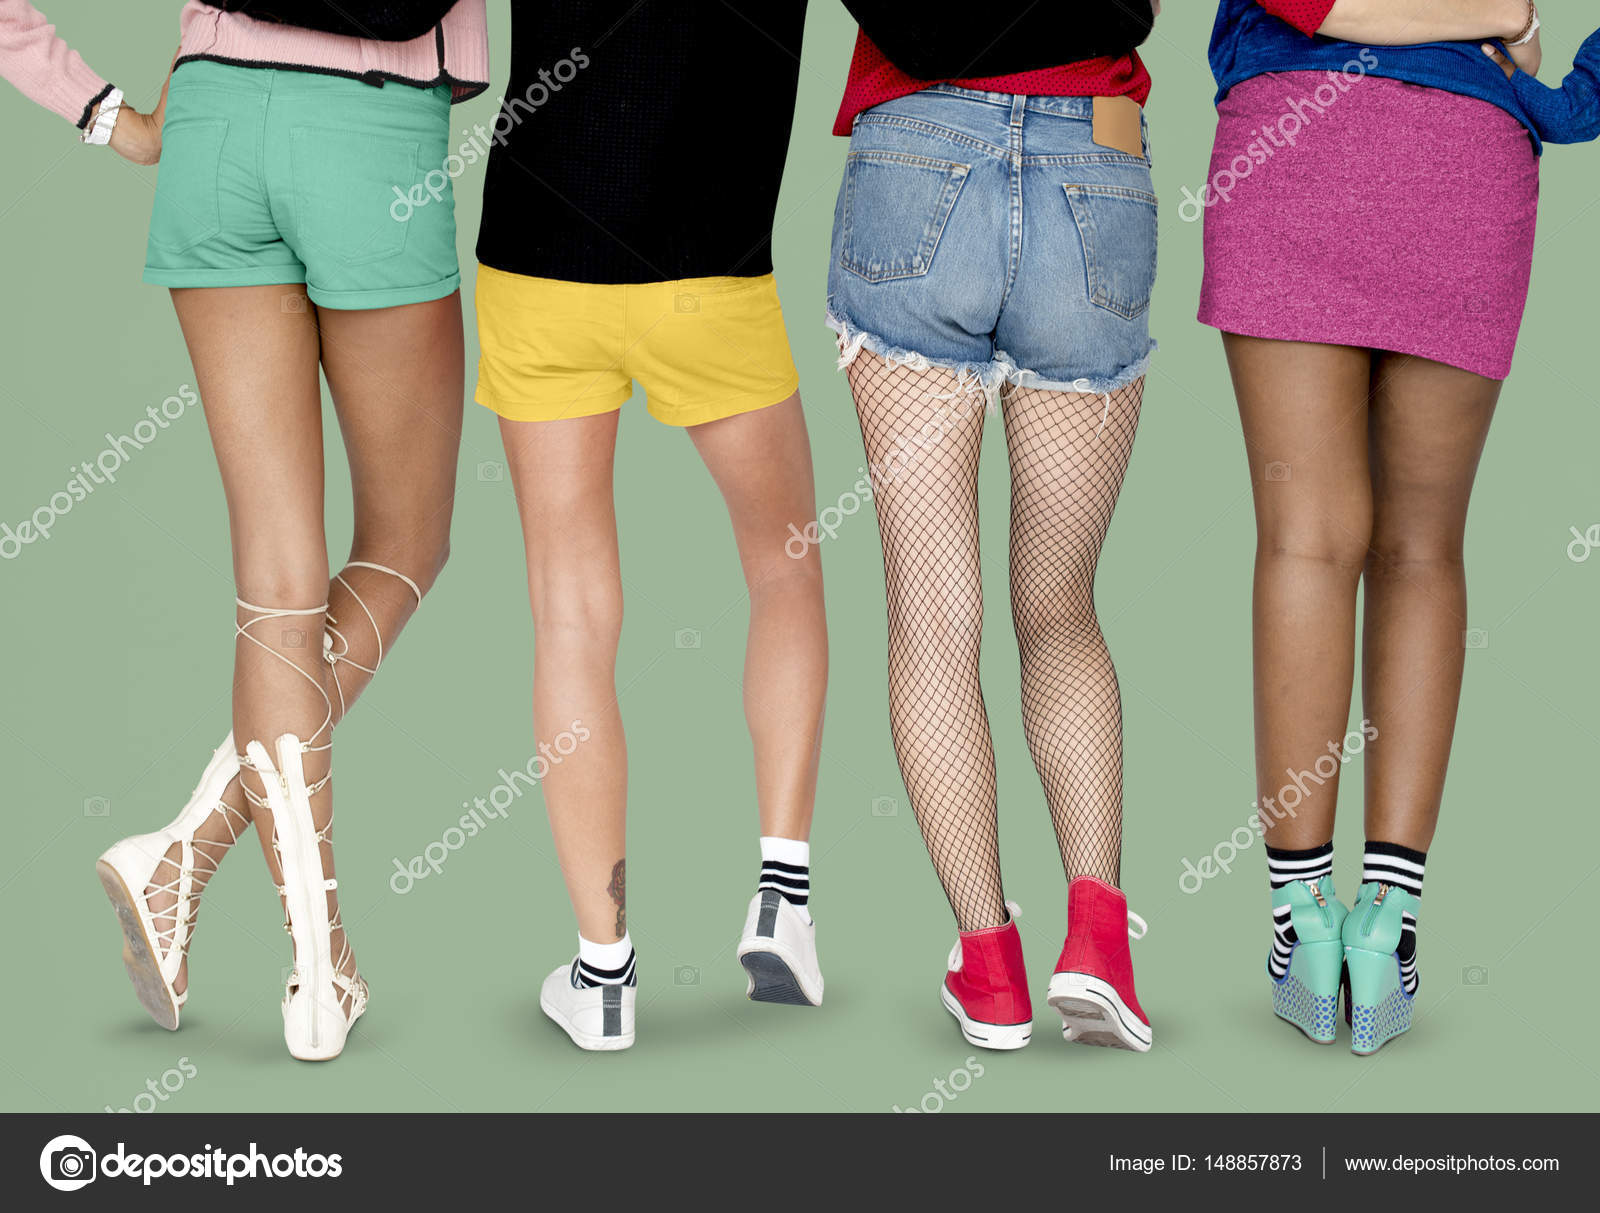 Женские ножки фото в студии фото 113-914